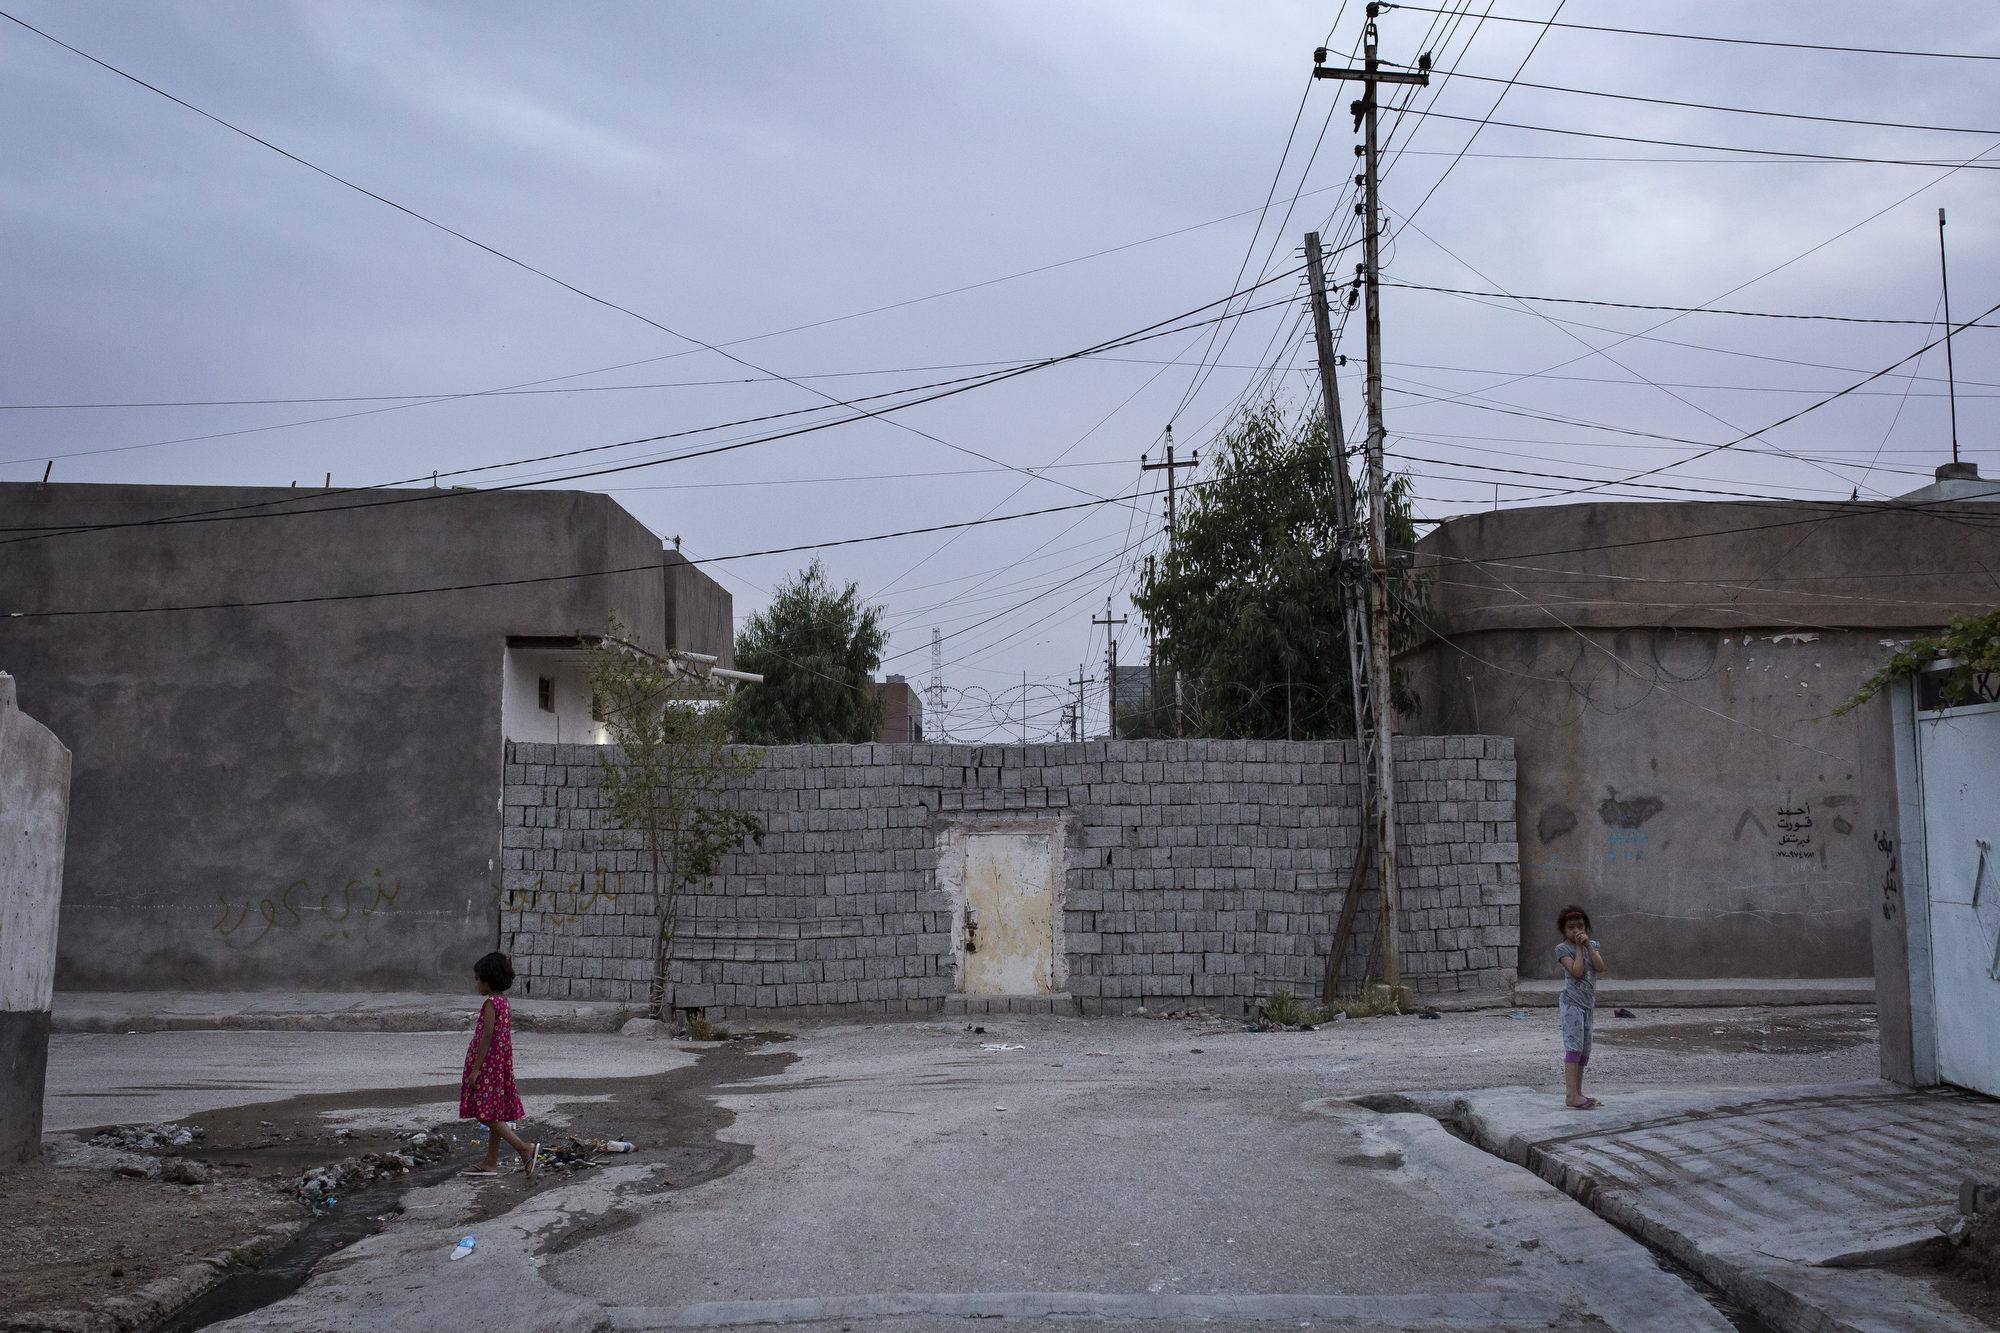 Children play near a wall separating Kurdish and Turkman areas.